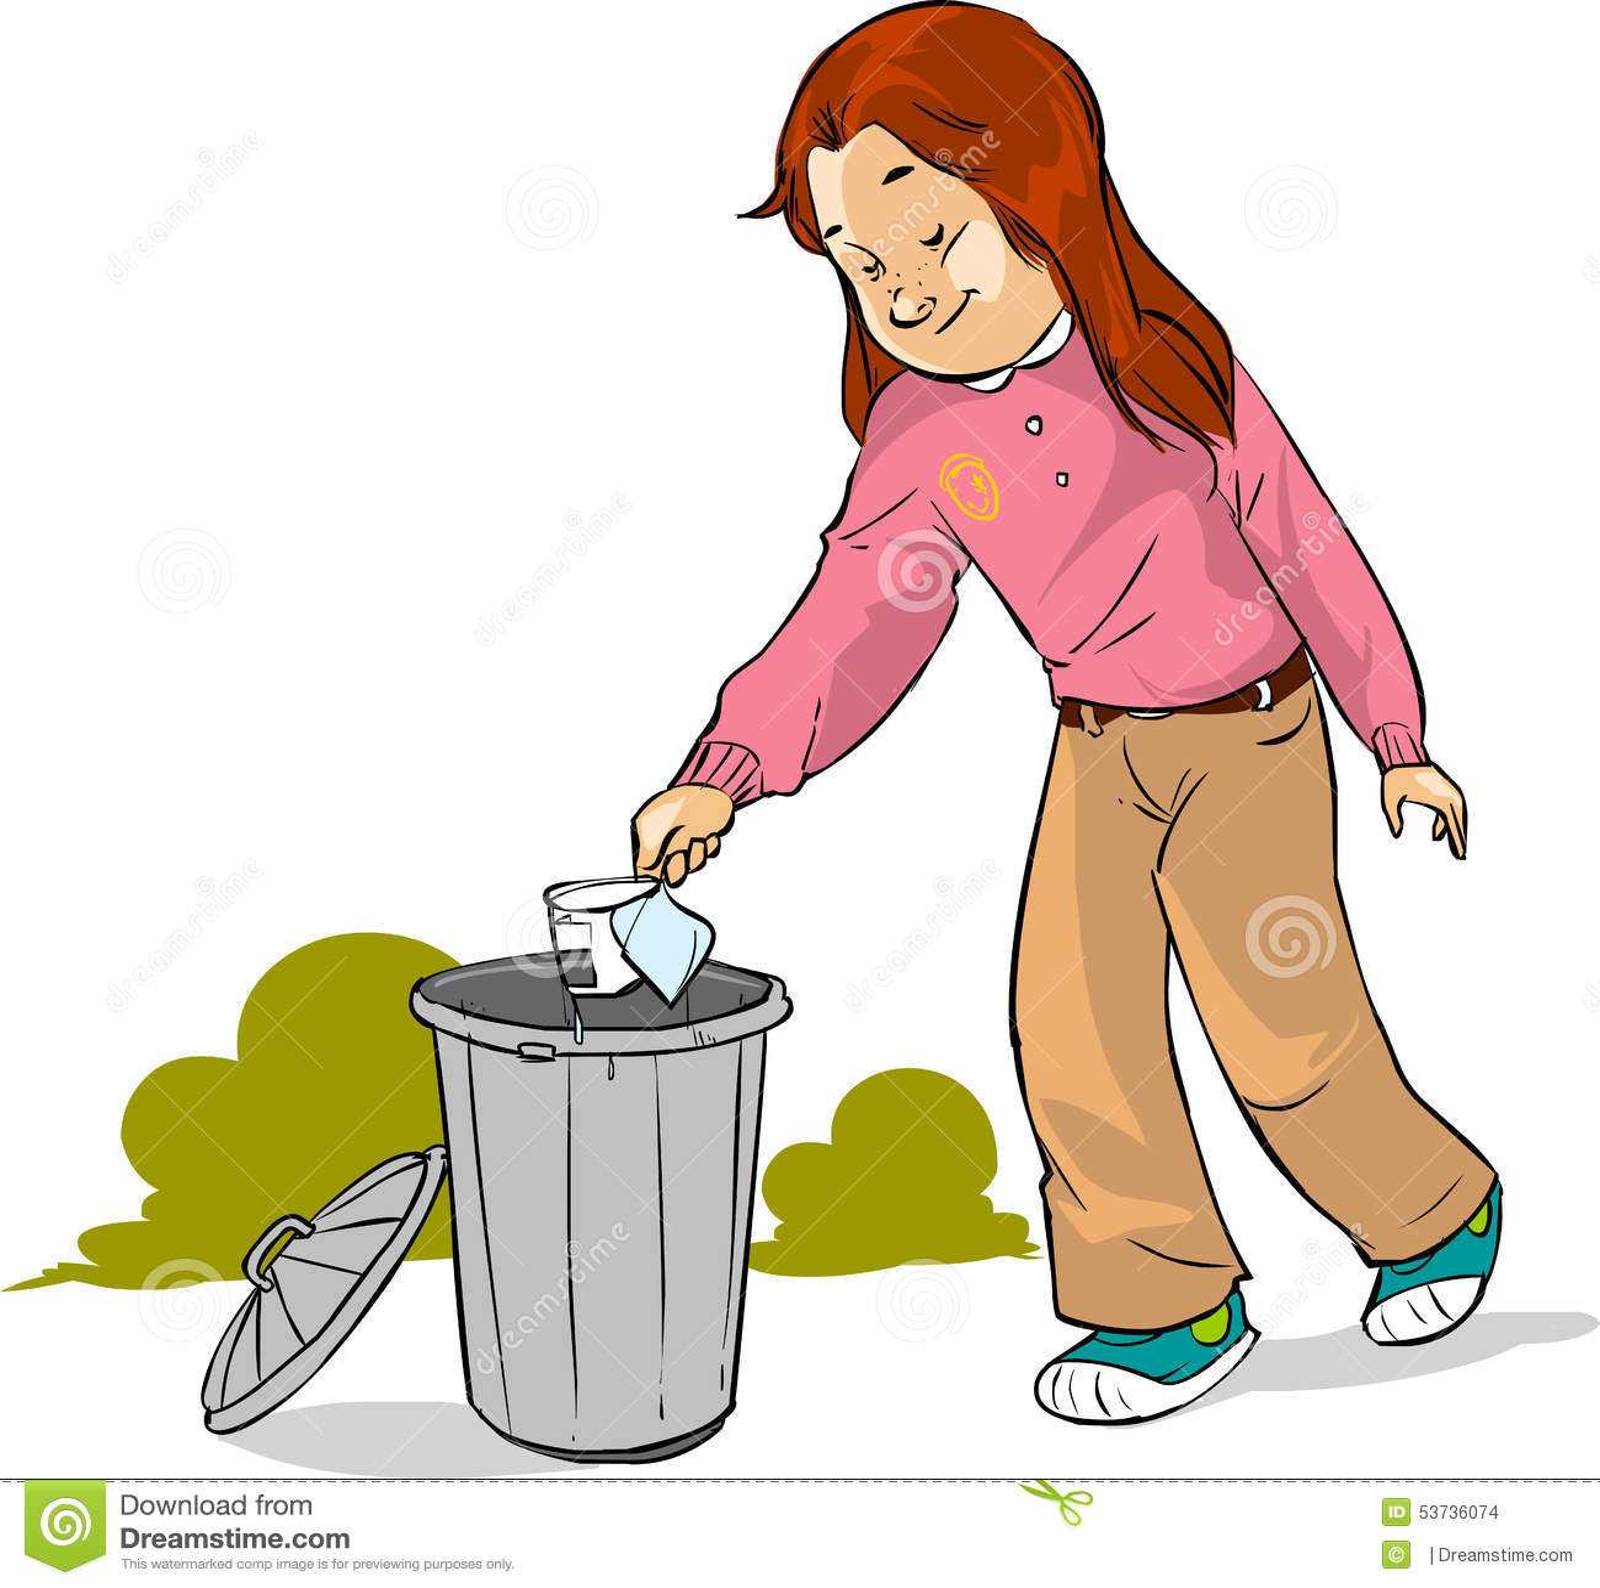 Sketch Floor Plans The Children Throw Garbage Stock Illustration